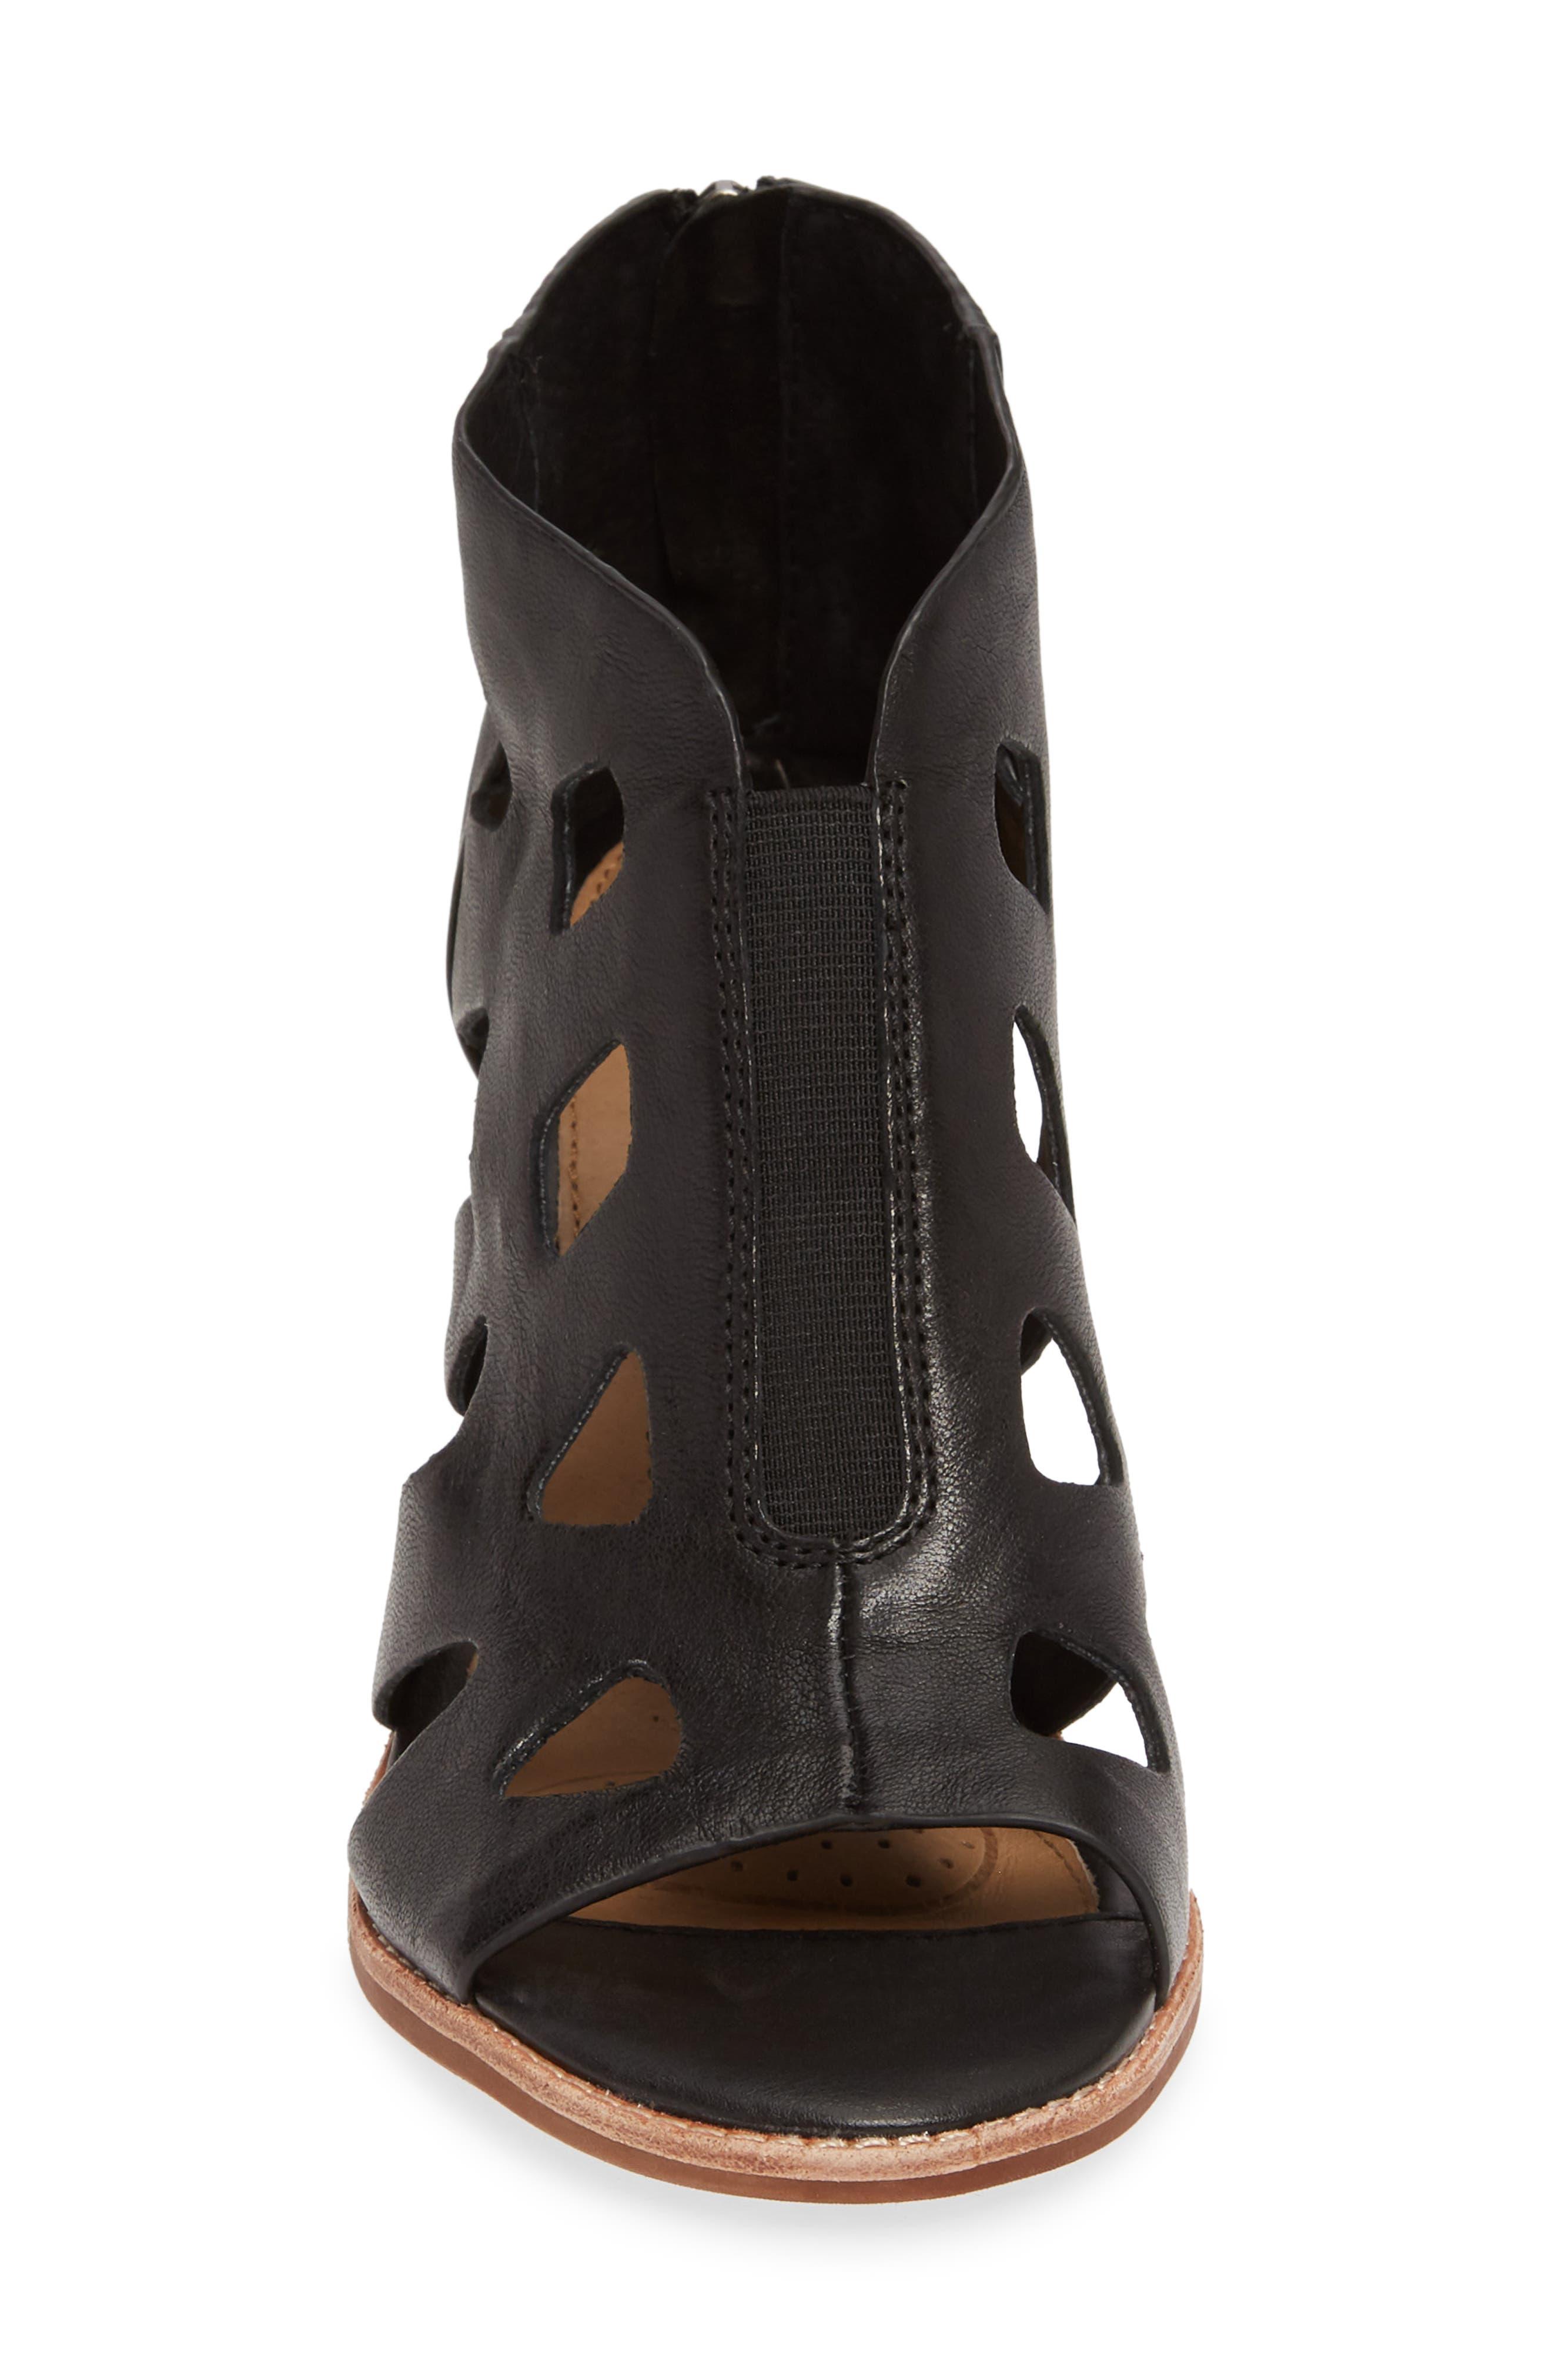 Pazia Block Heel Sandal,                             Alternate thumbnail 4, color,                             BLACK LEATHER